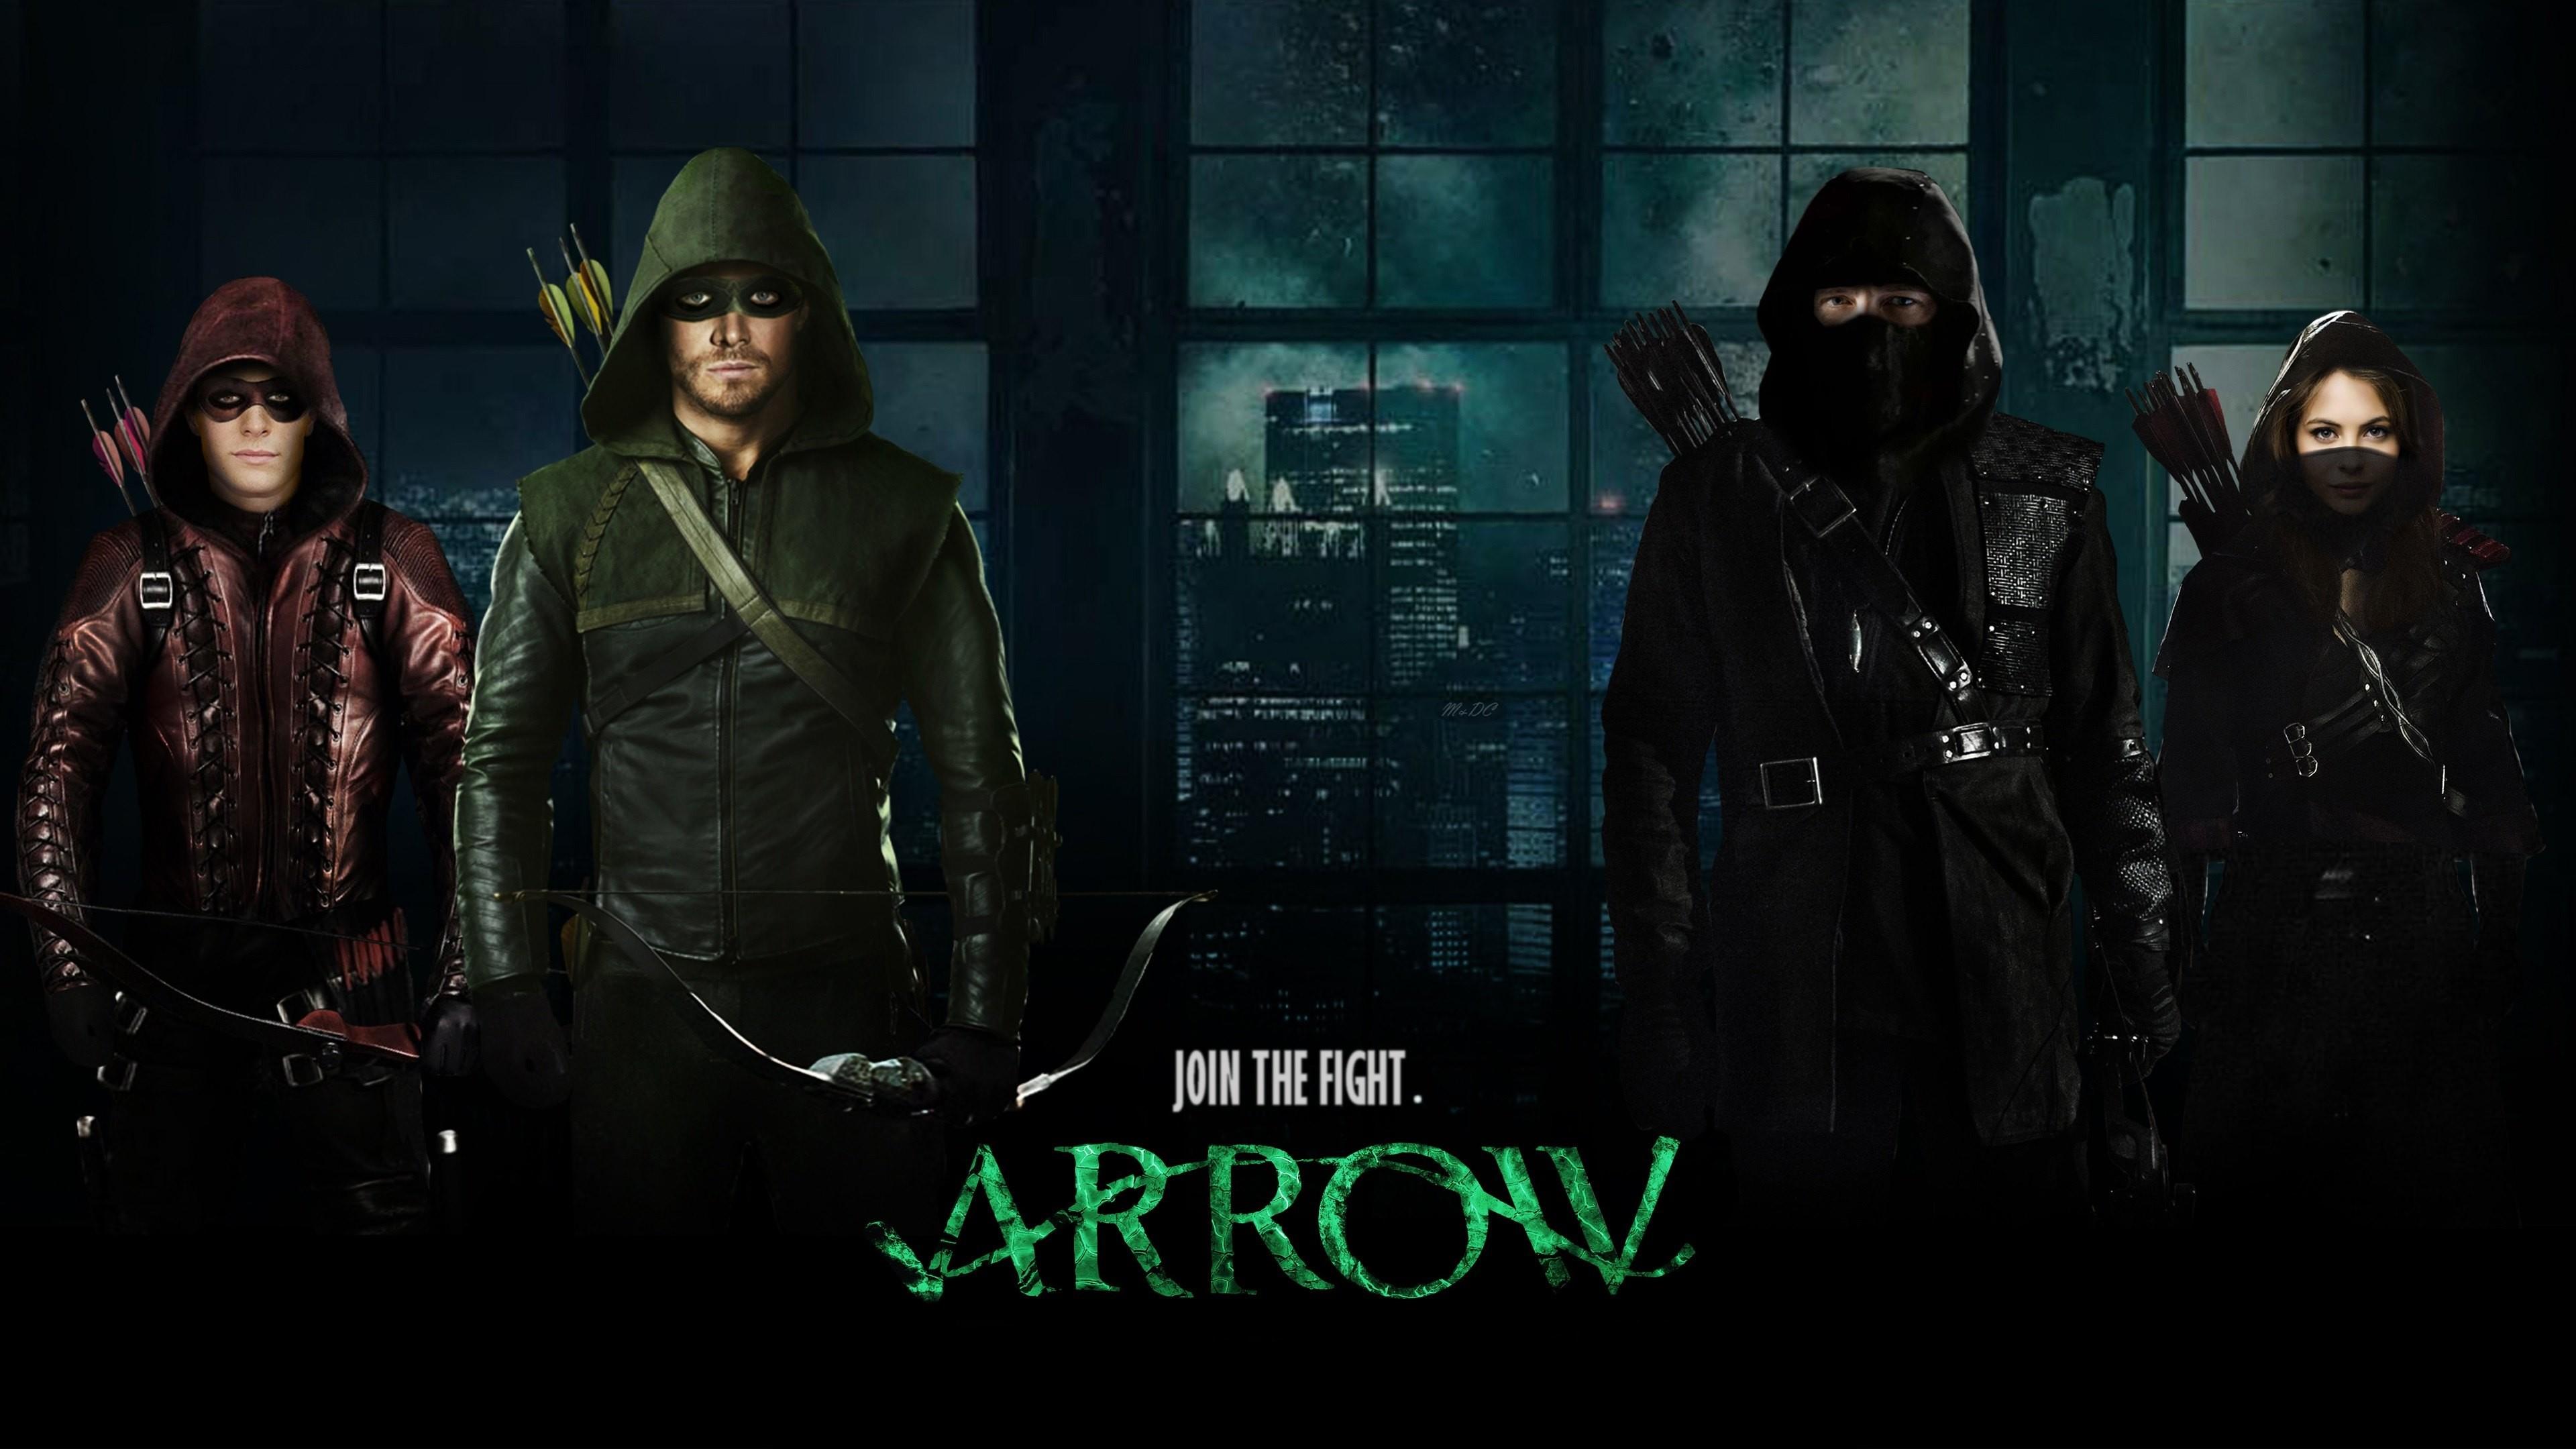 Arrow Tv Series Wallpaper